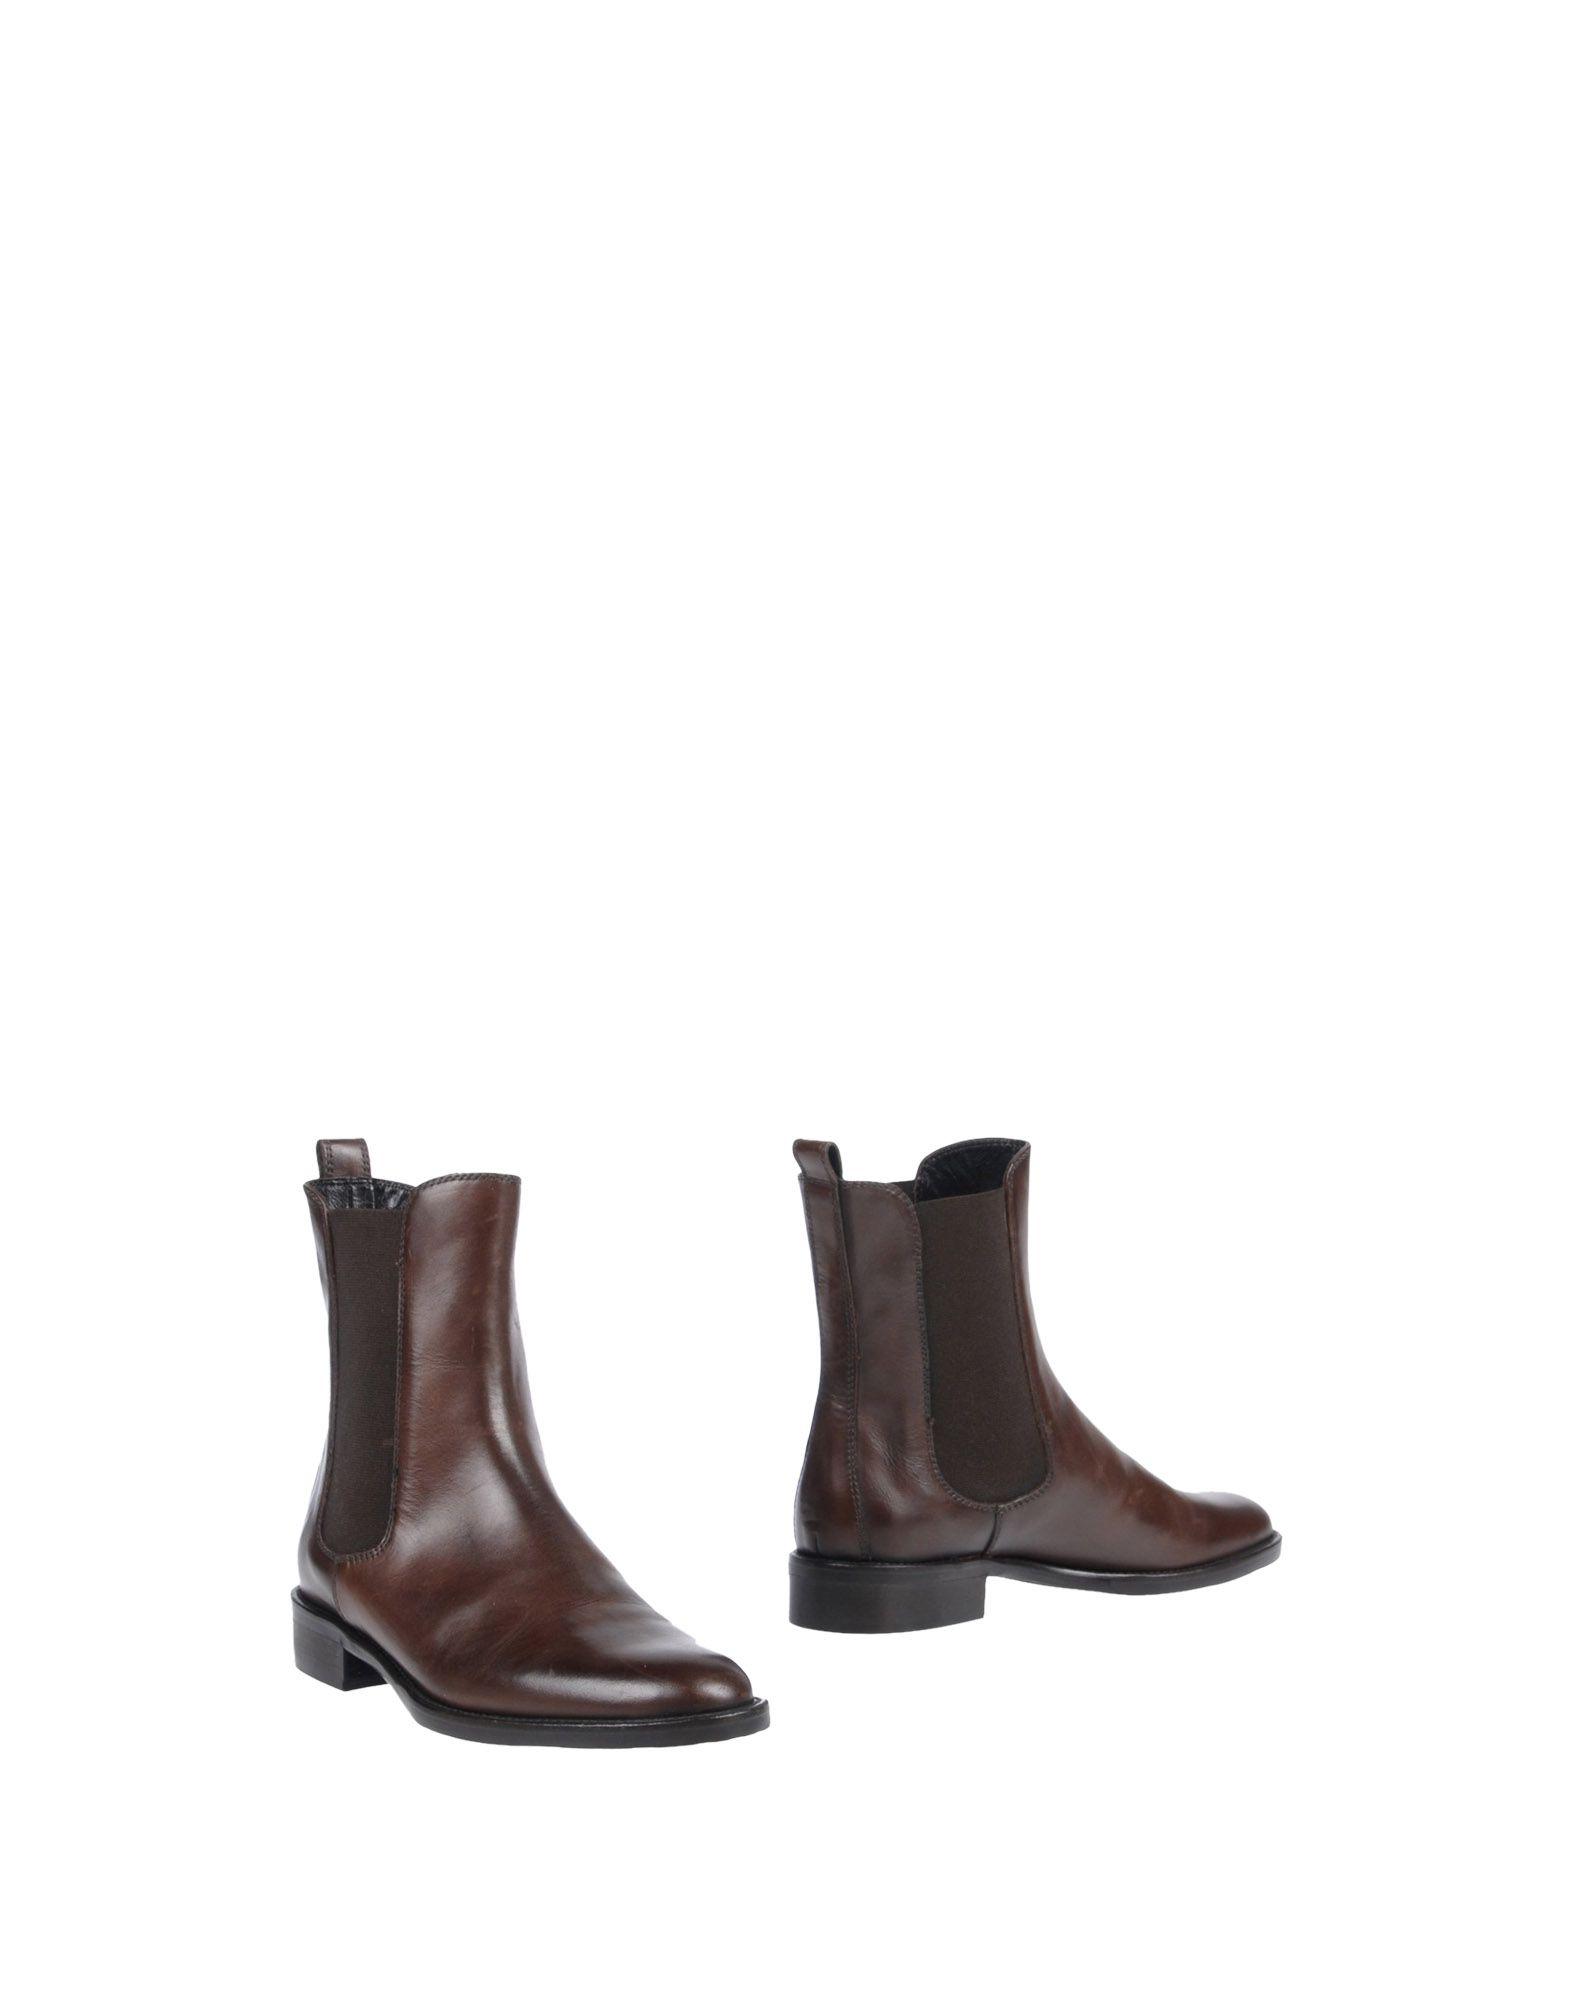 E'CLAT Полусапоги и высокие ботинки magazzini del sale полусапоги и высокие ботинки